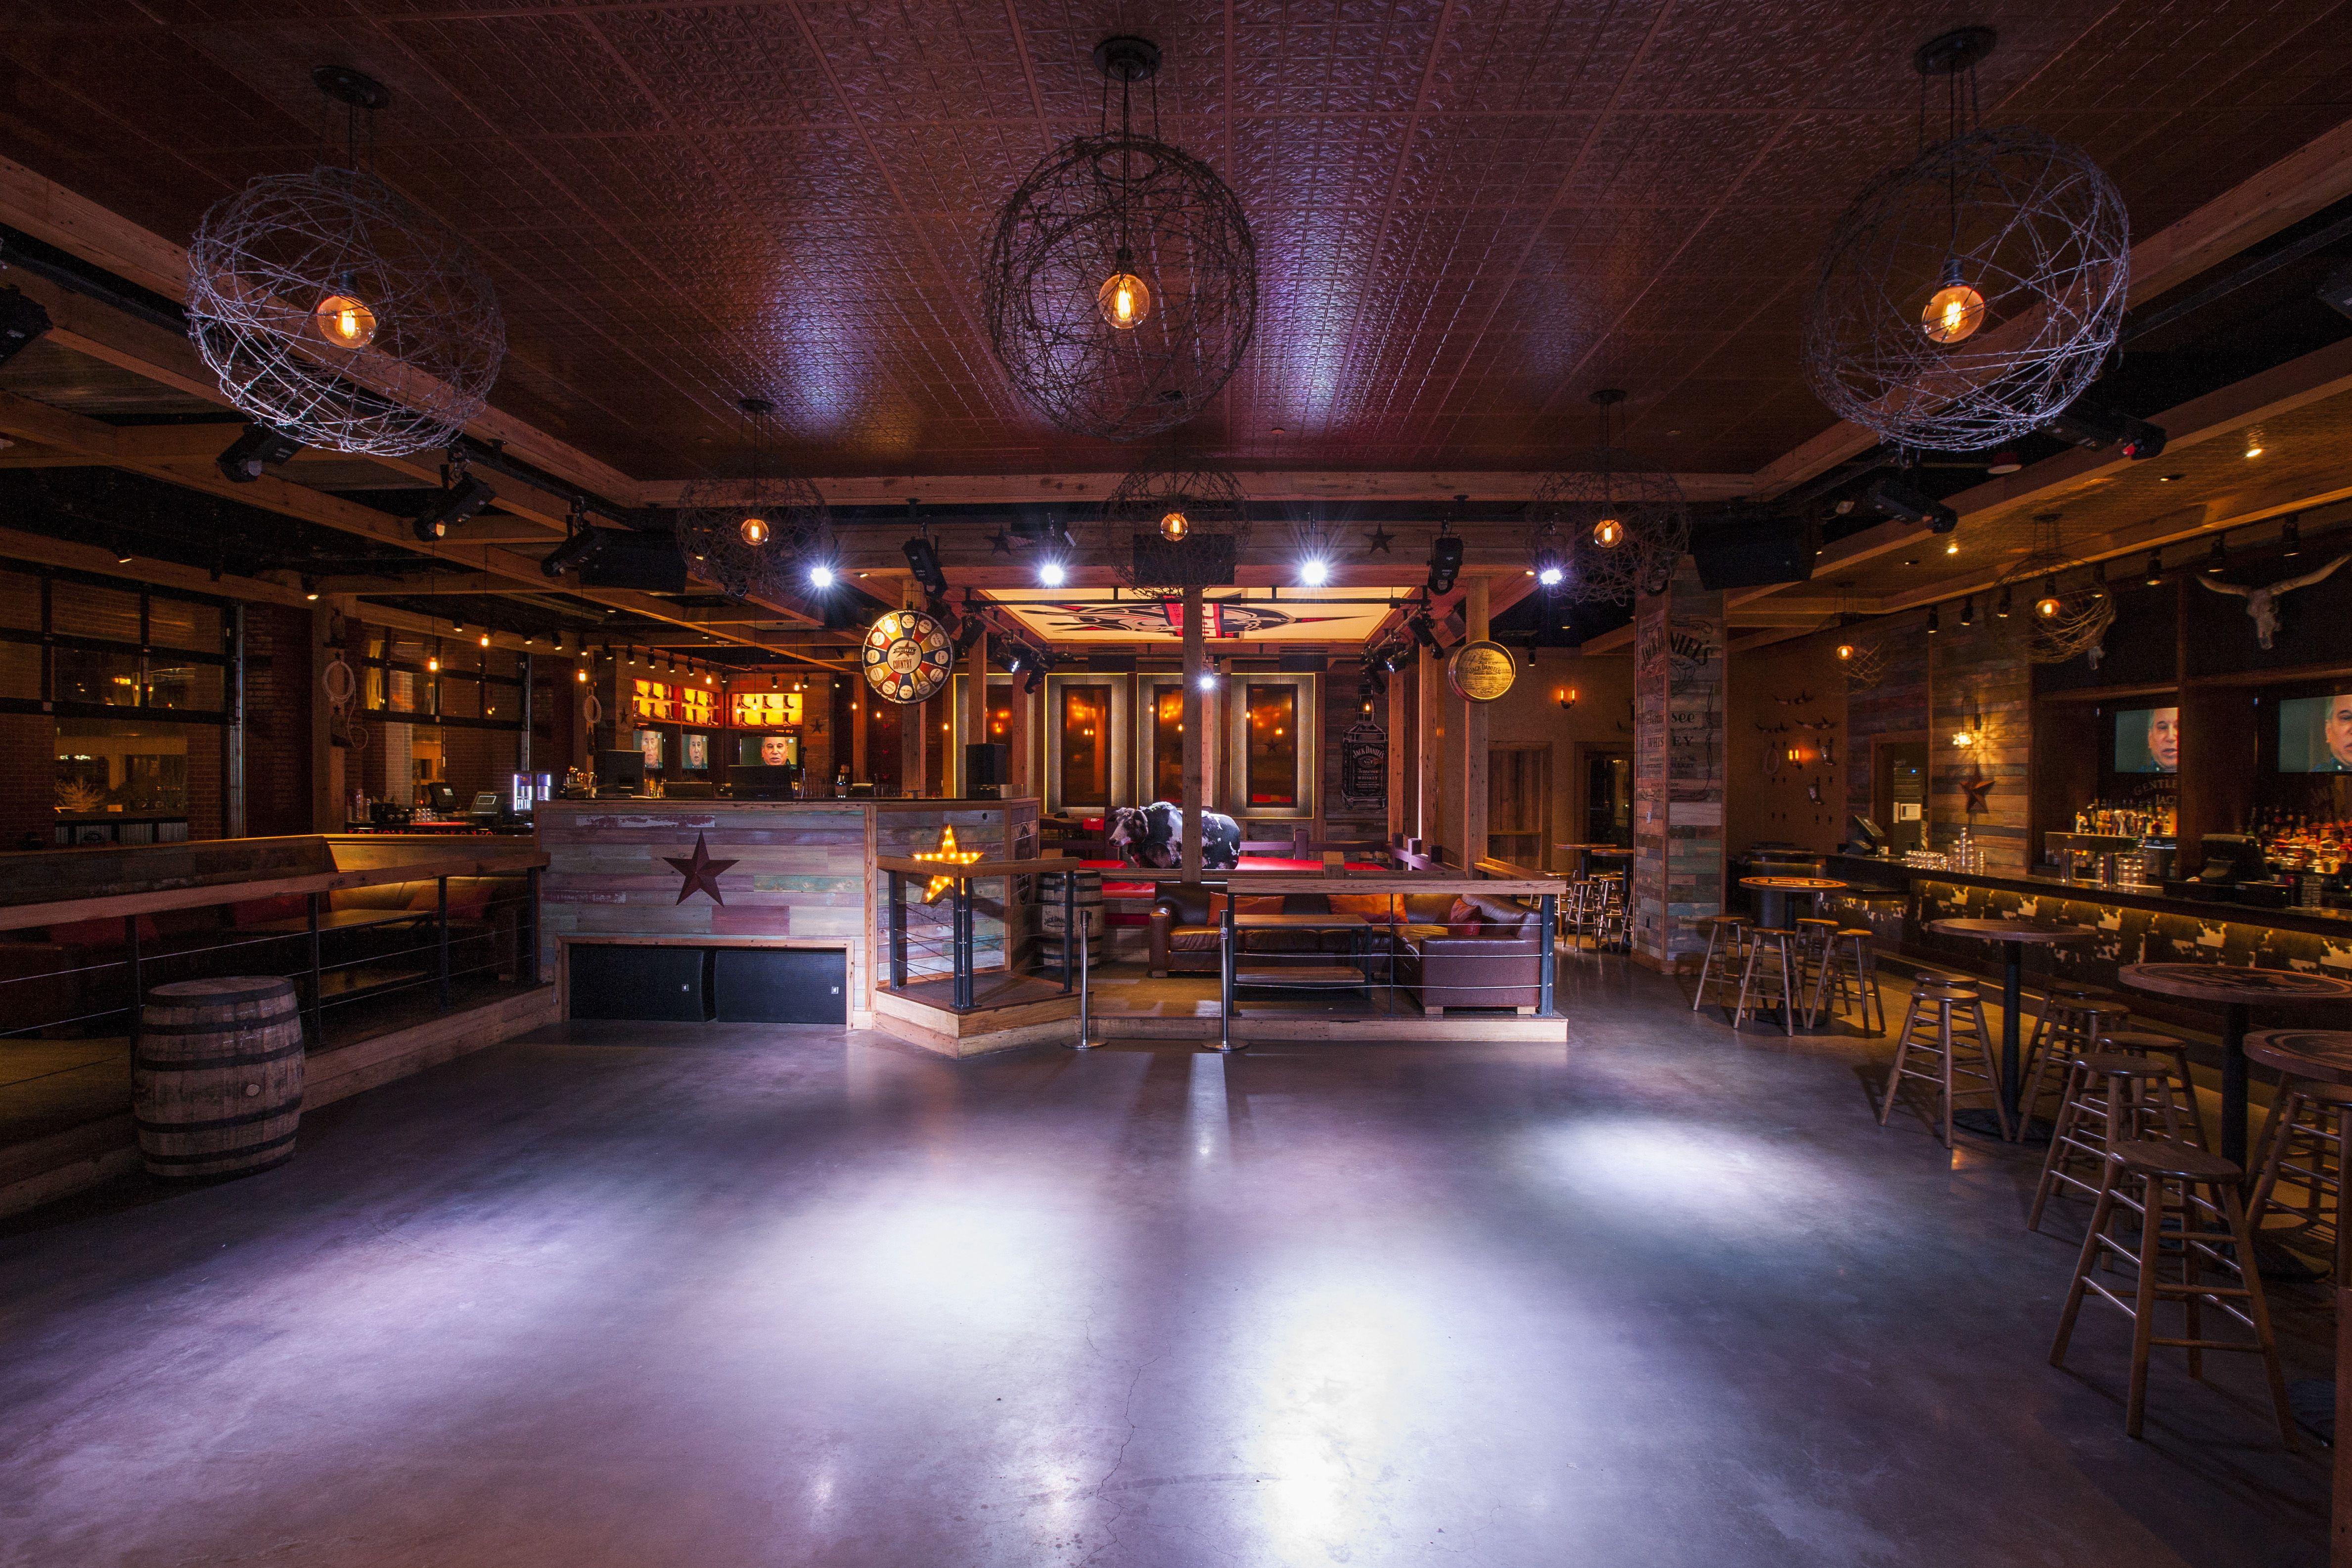 Dance Floor Pbr St Louis Pbr Cowboy Bar In 2019